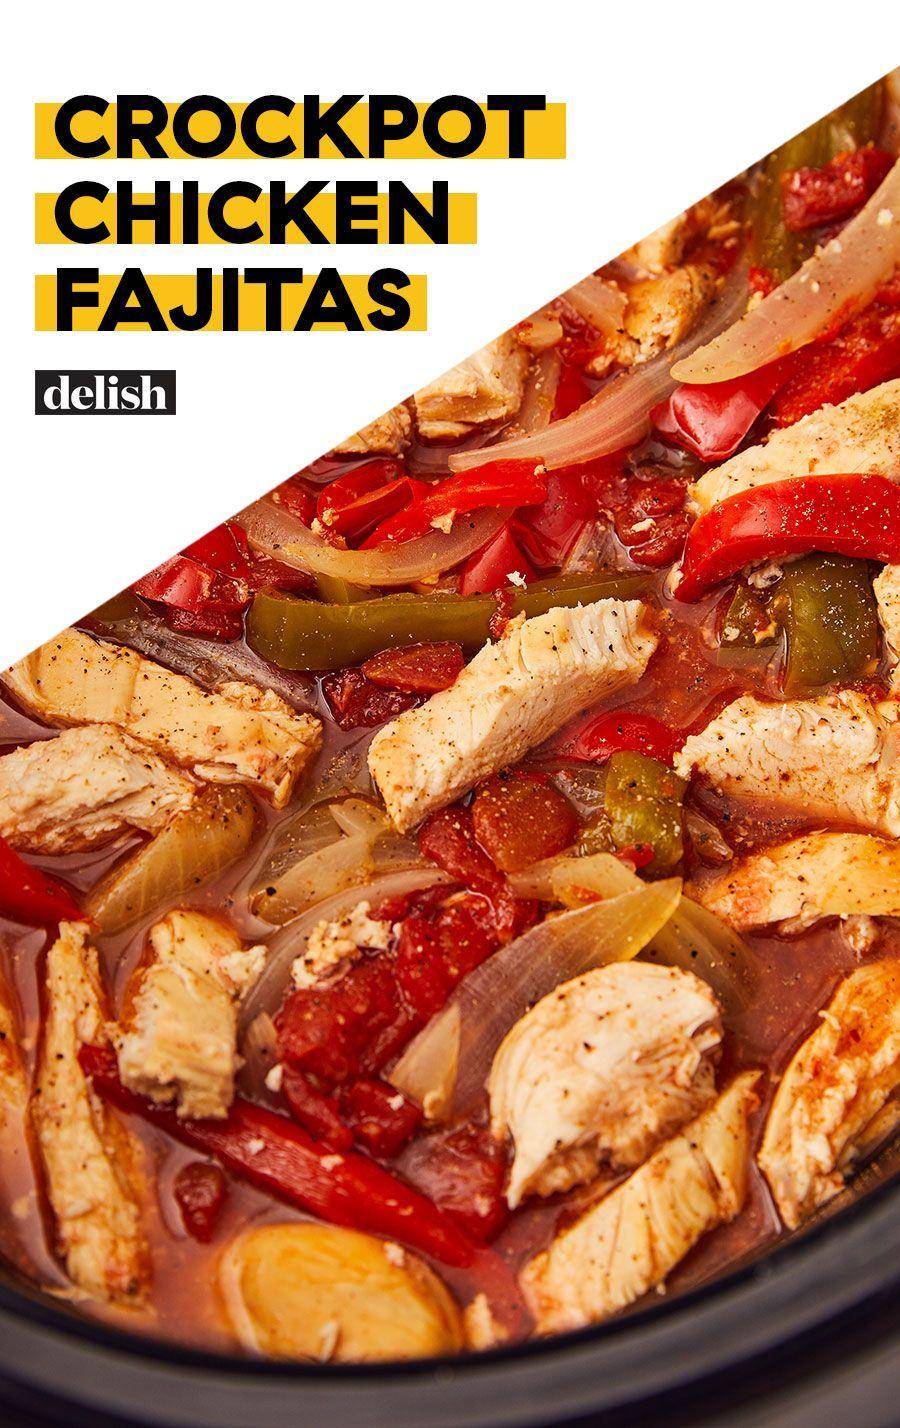 Crockpot Chicken Fajitas Recipe In 2020 Chicken Fajita Recipe Chicken Fajitas Fajitas